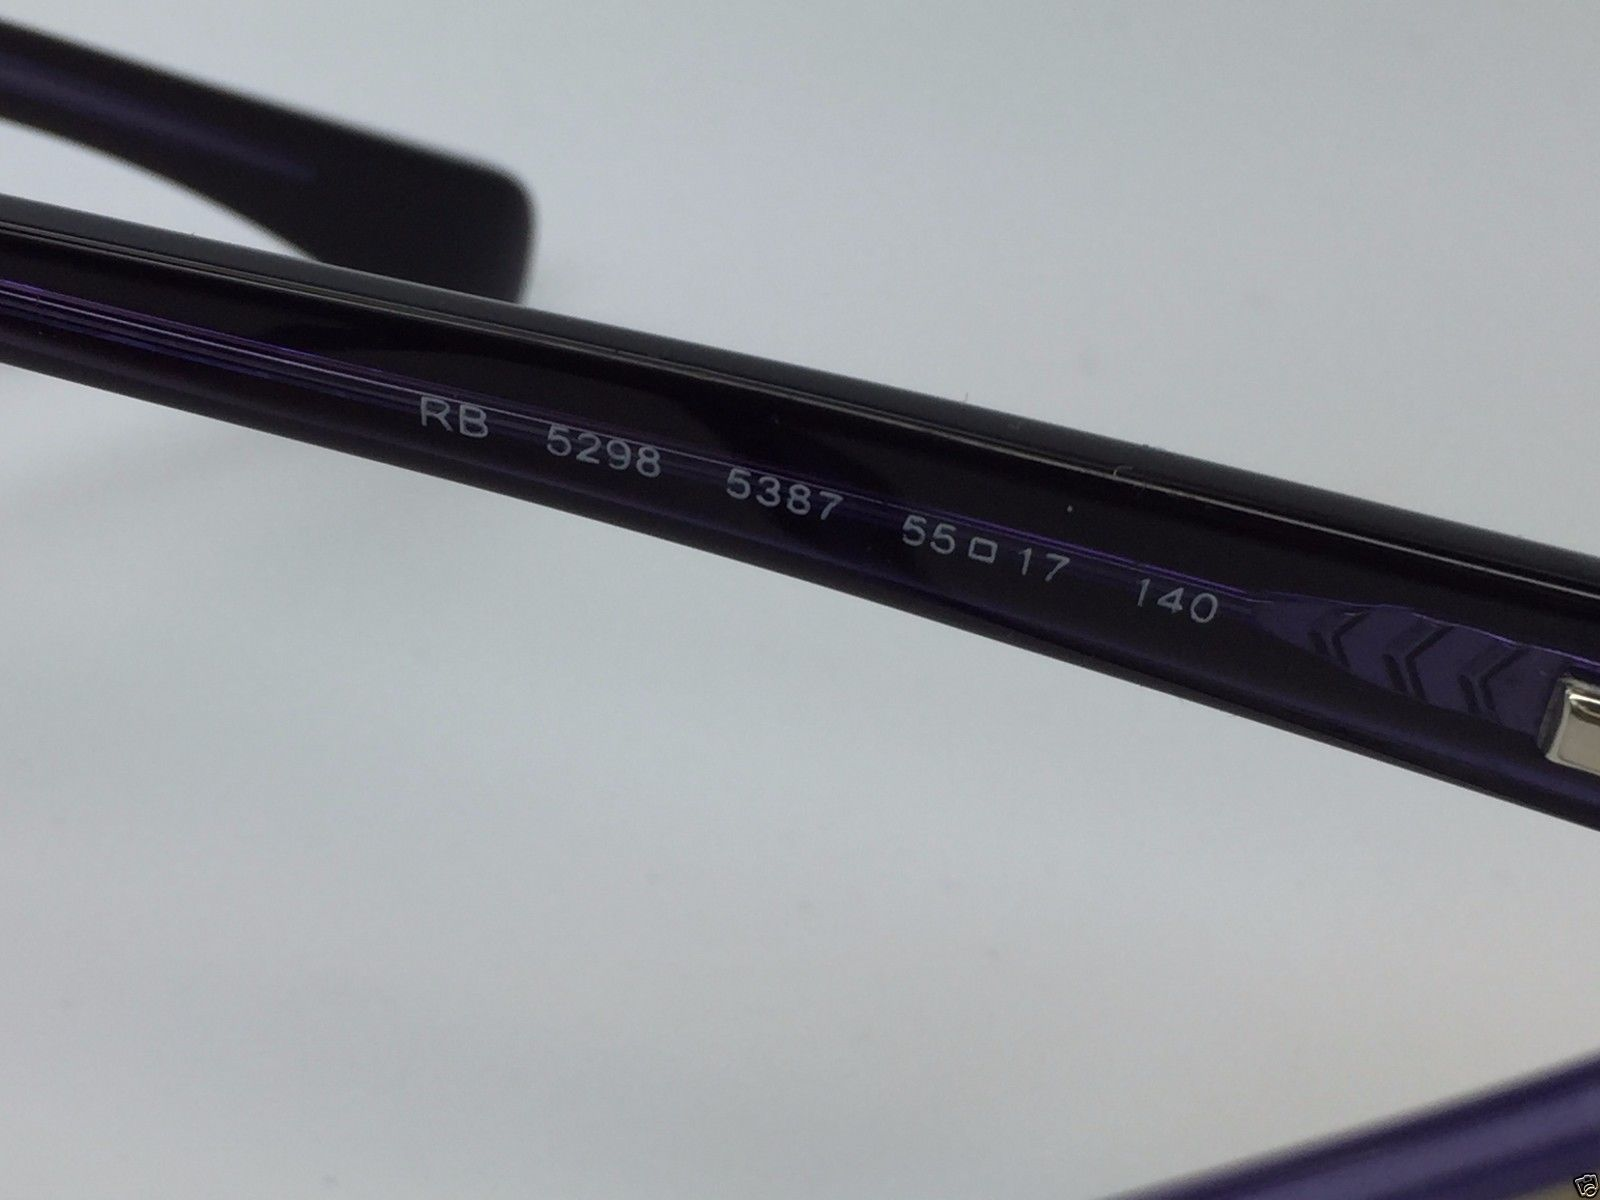 8dc3d3a003d Ray-Ban RB 5298 5387 Matte Beige on Purple New Authentic Eyeglasses 55 17